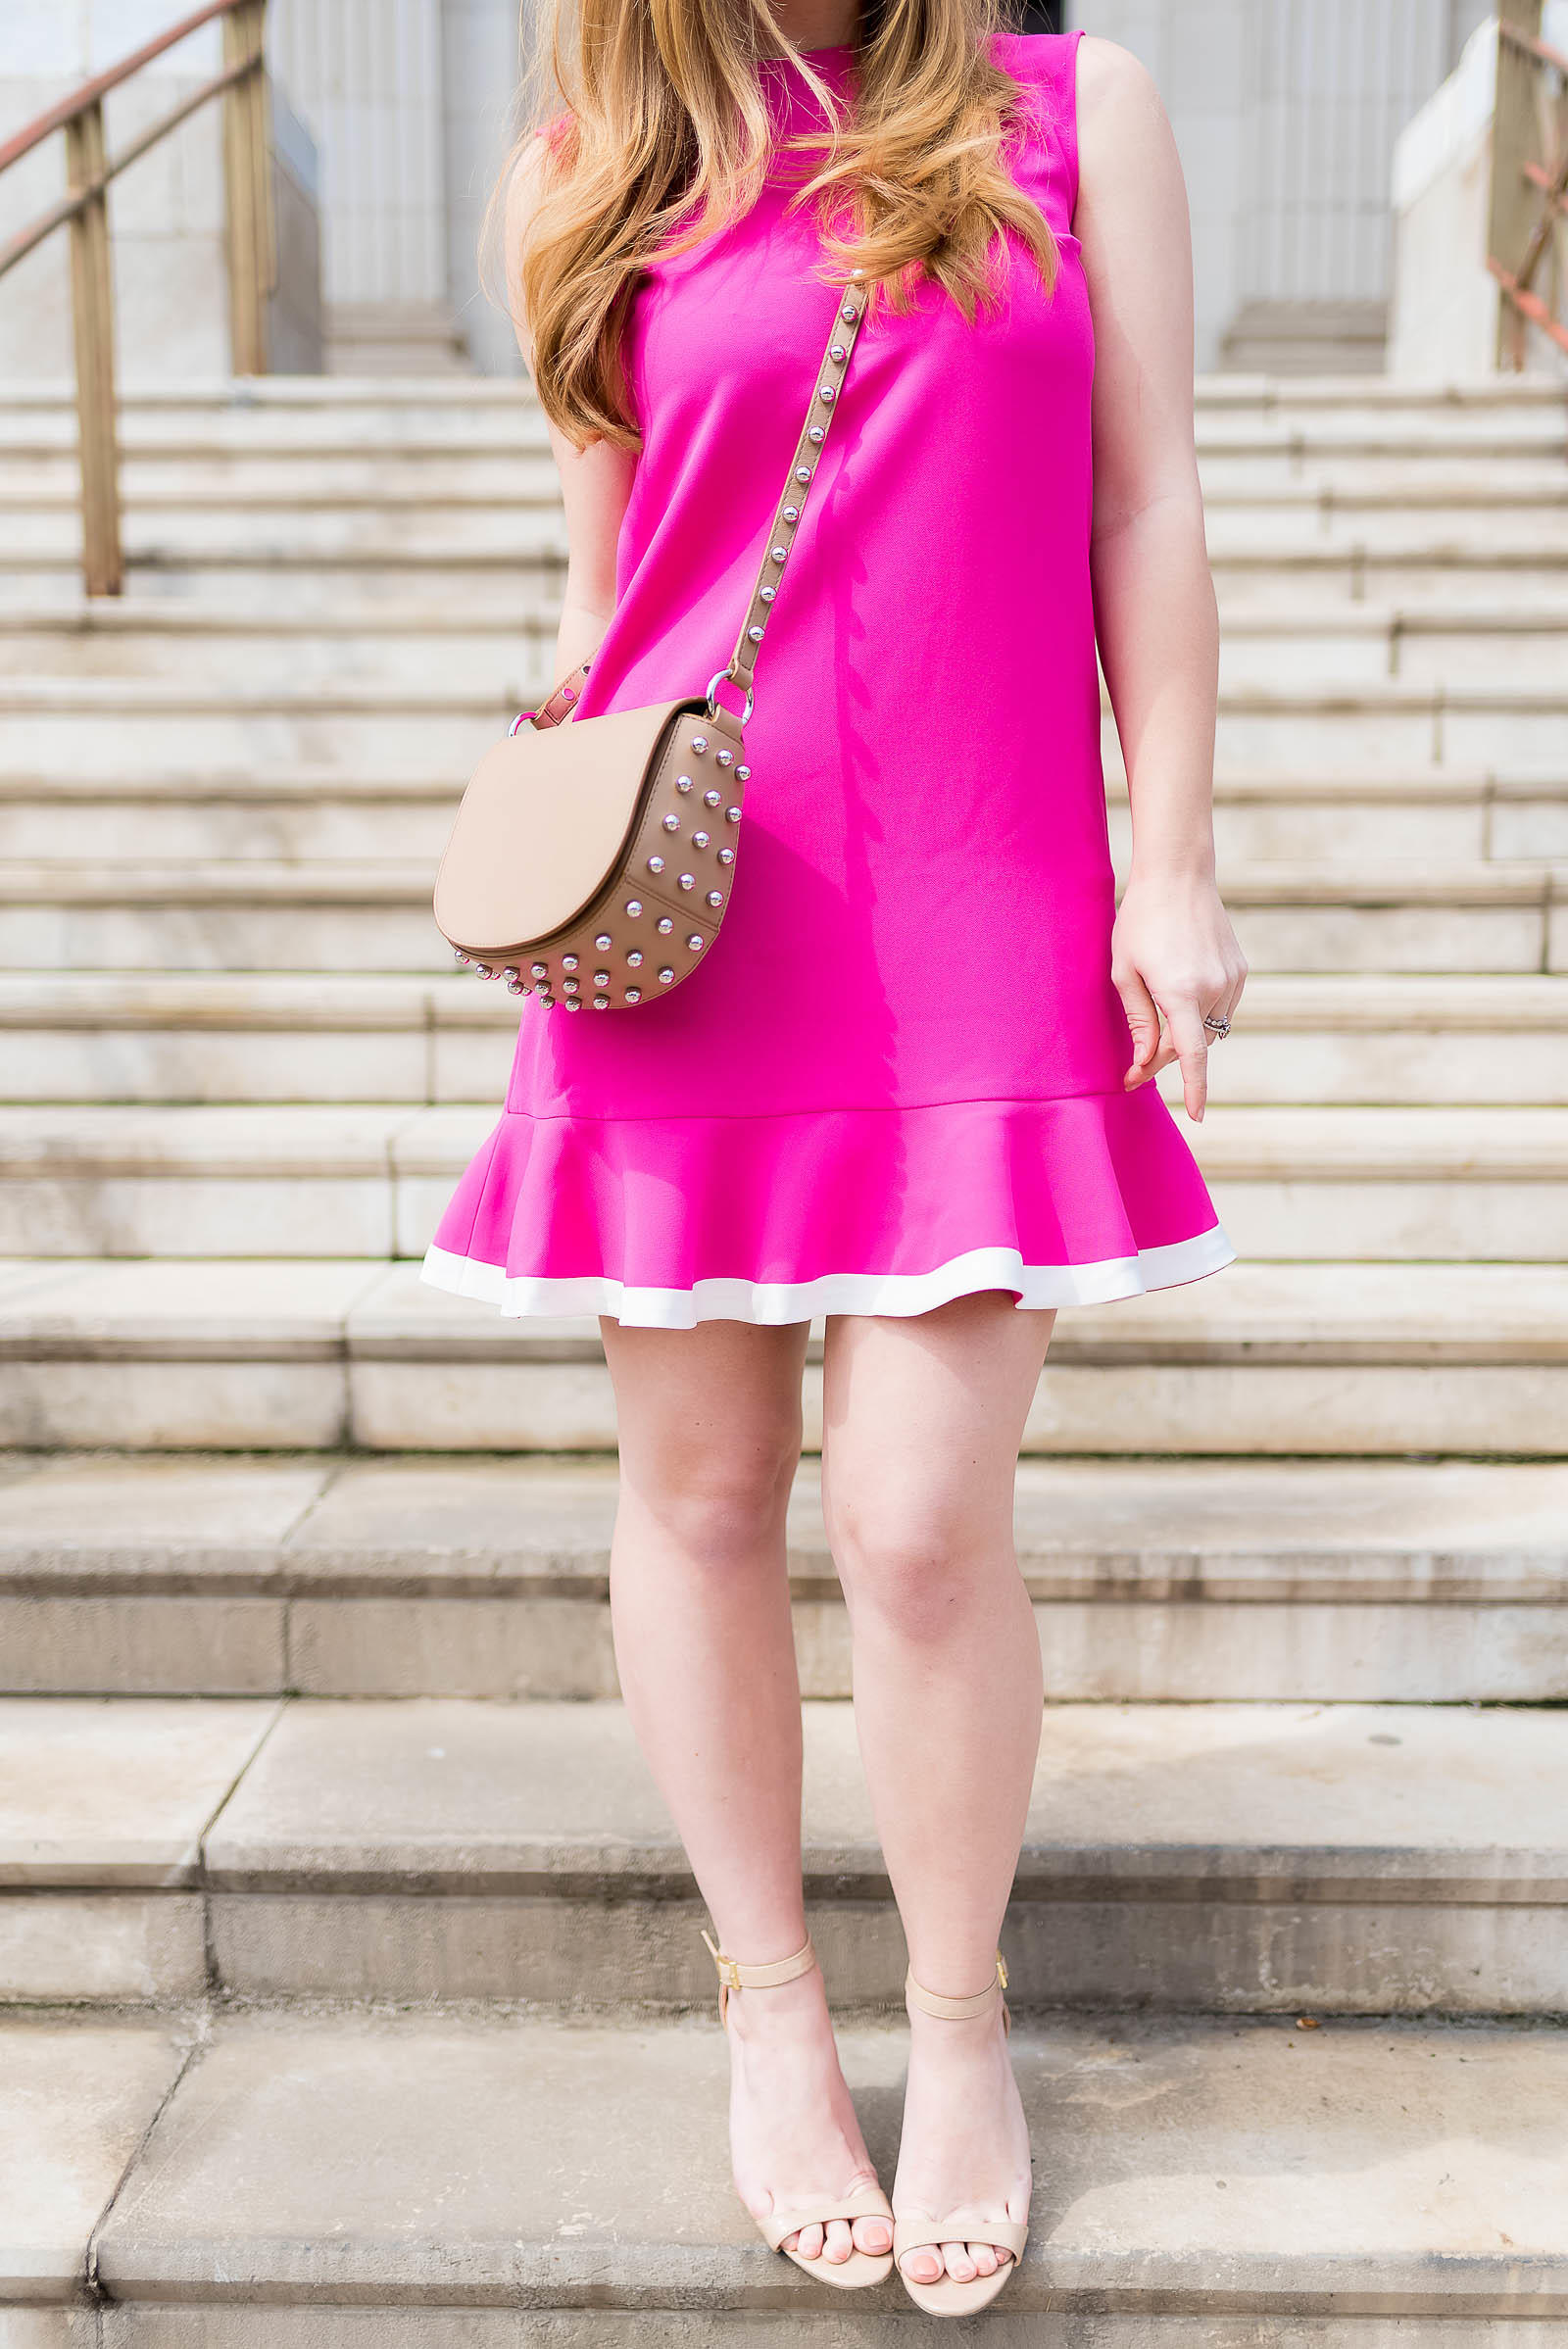 Victoria Beckham Target Alexander Wang Spring Outfit